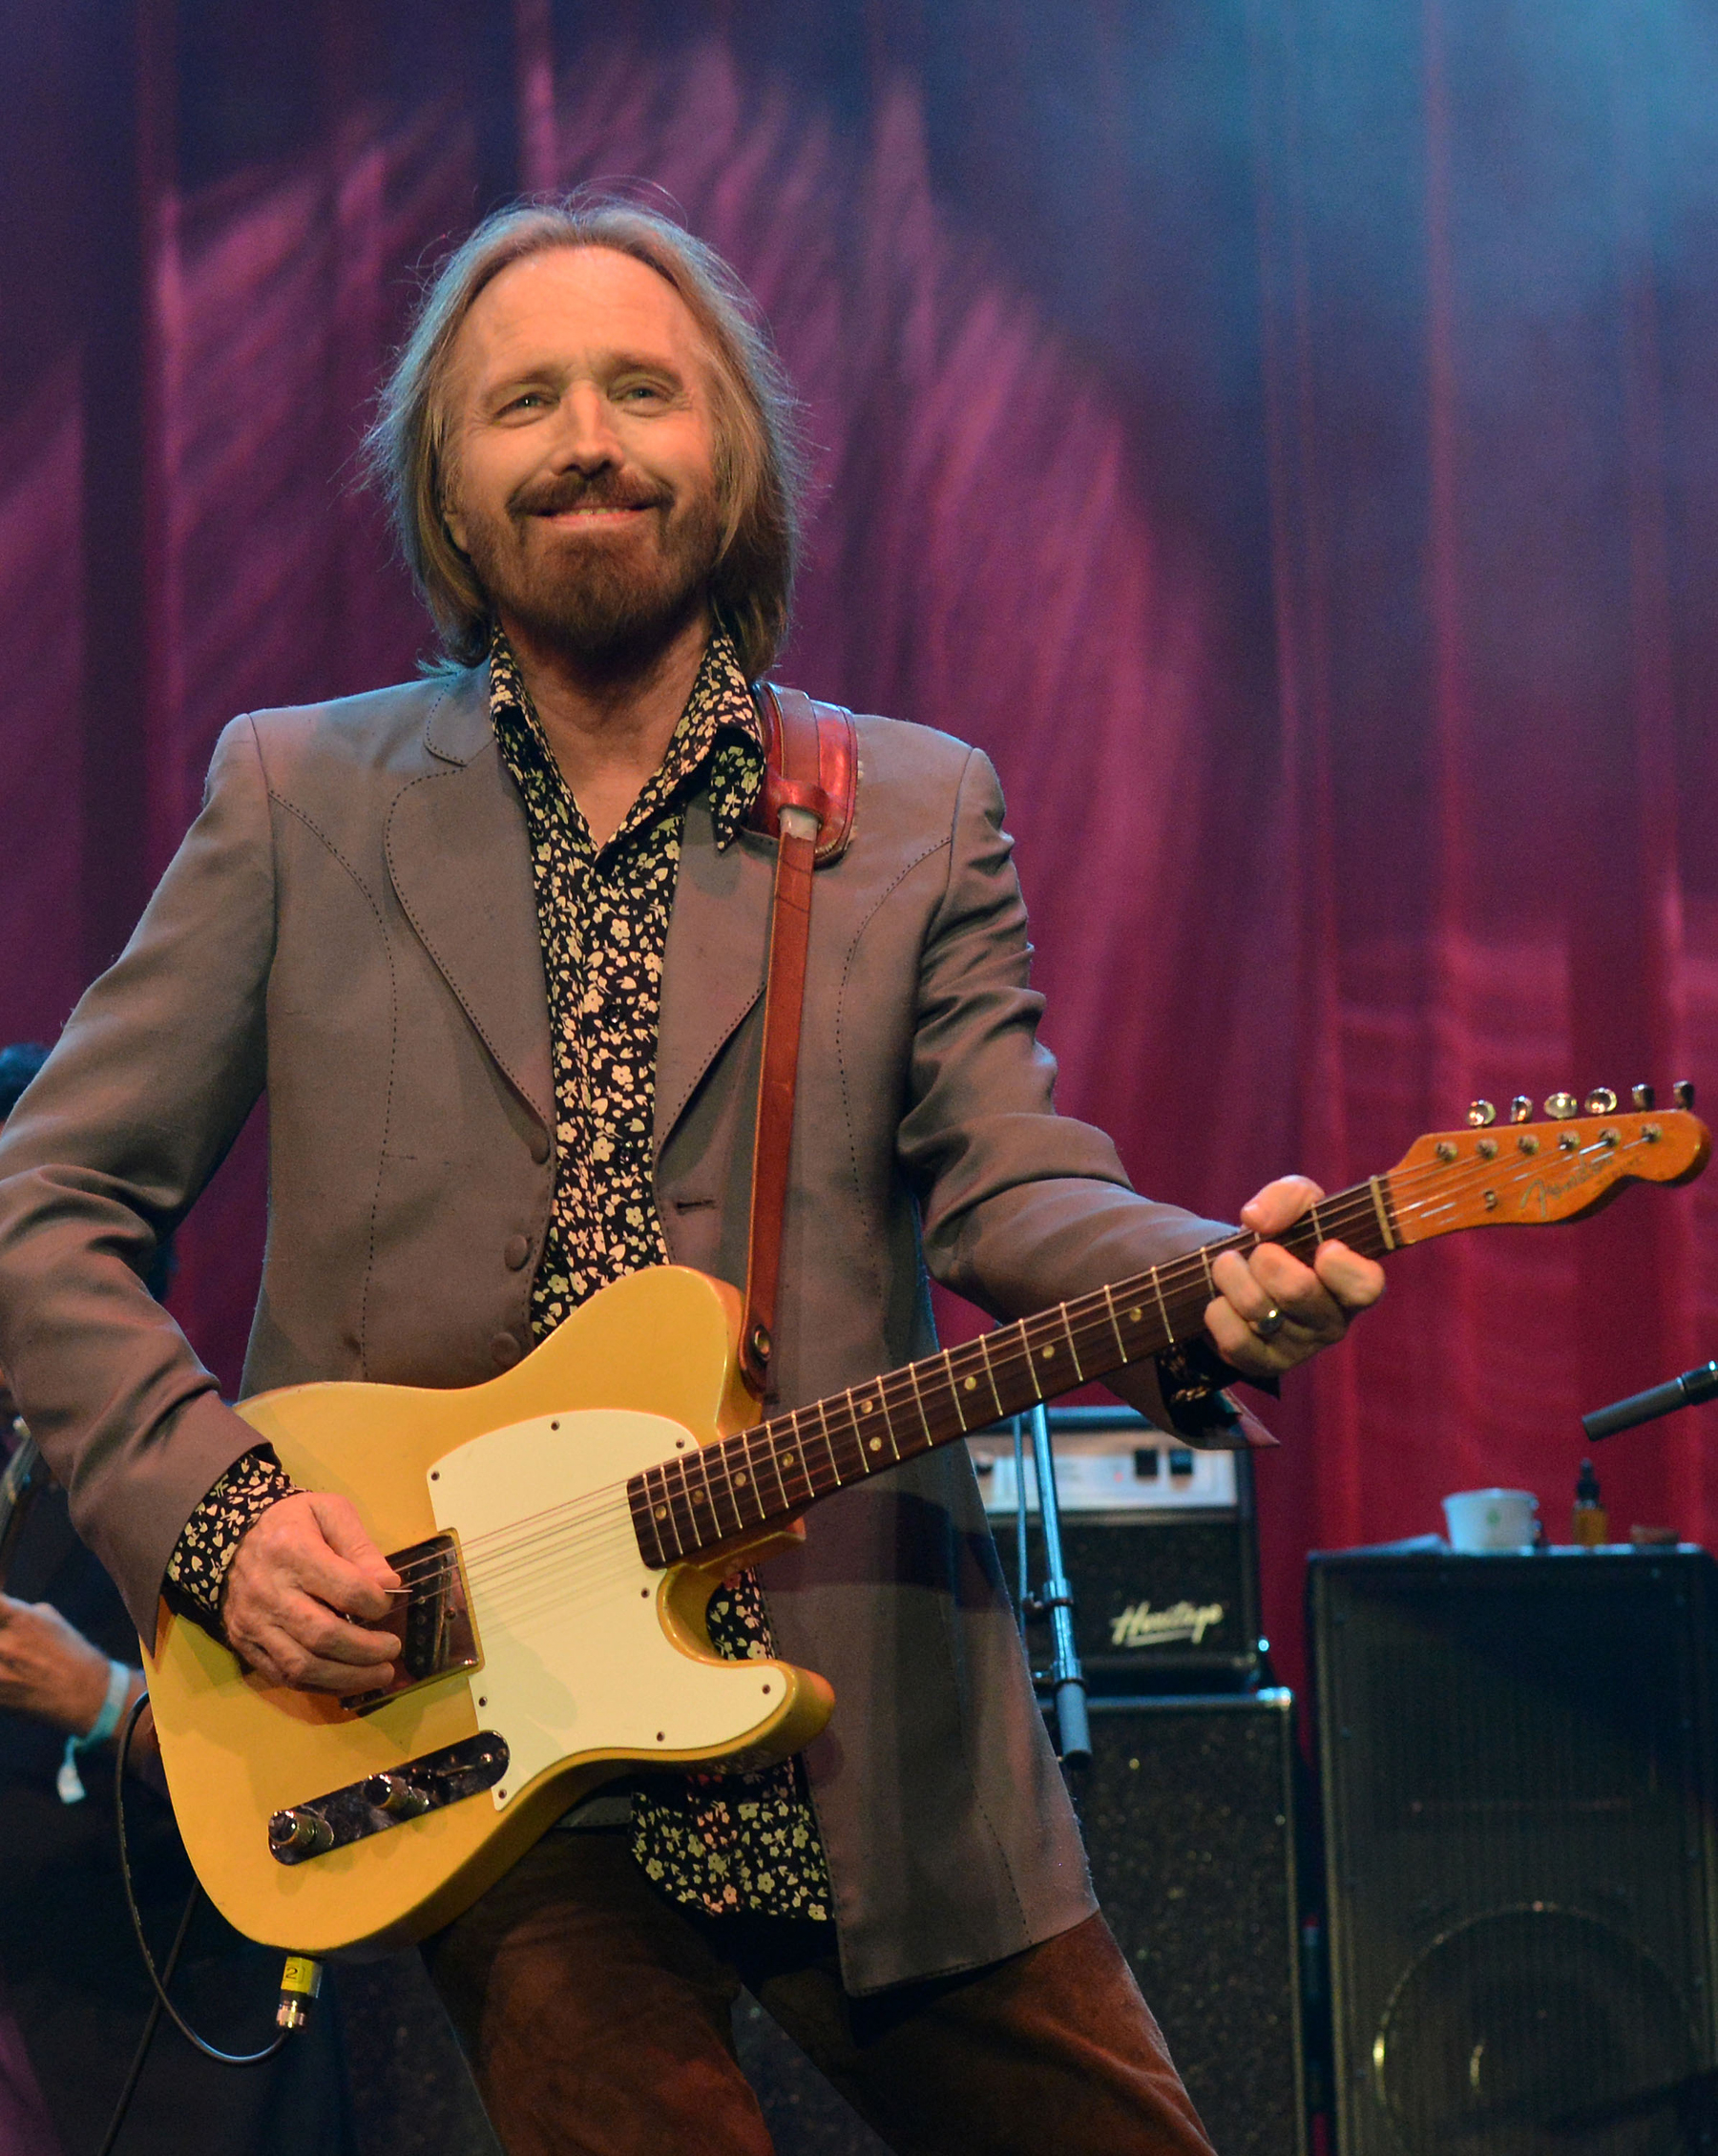 Tom Petty: Rolling Stones Were 'My Punk Music'